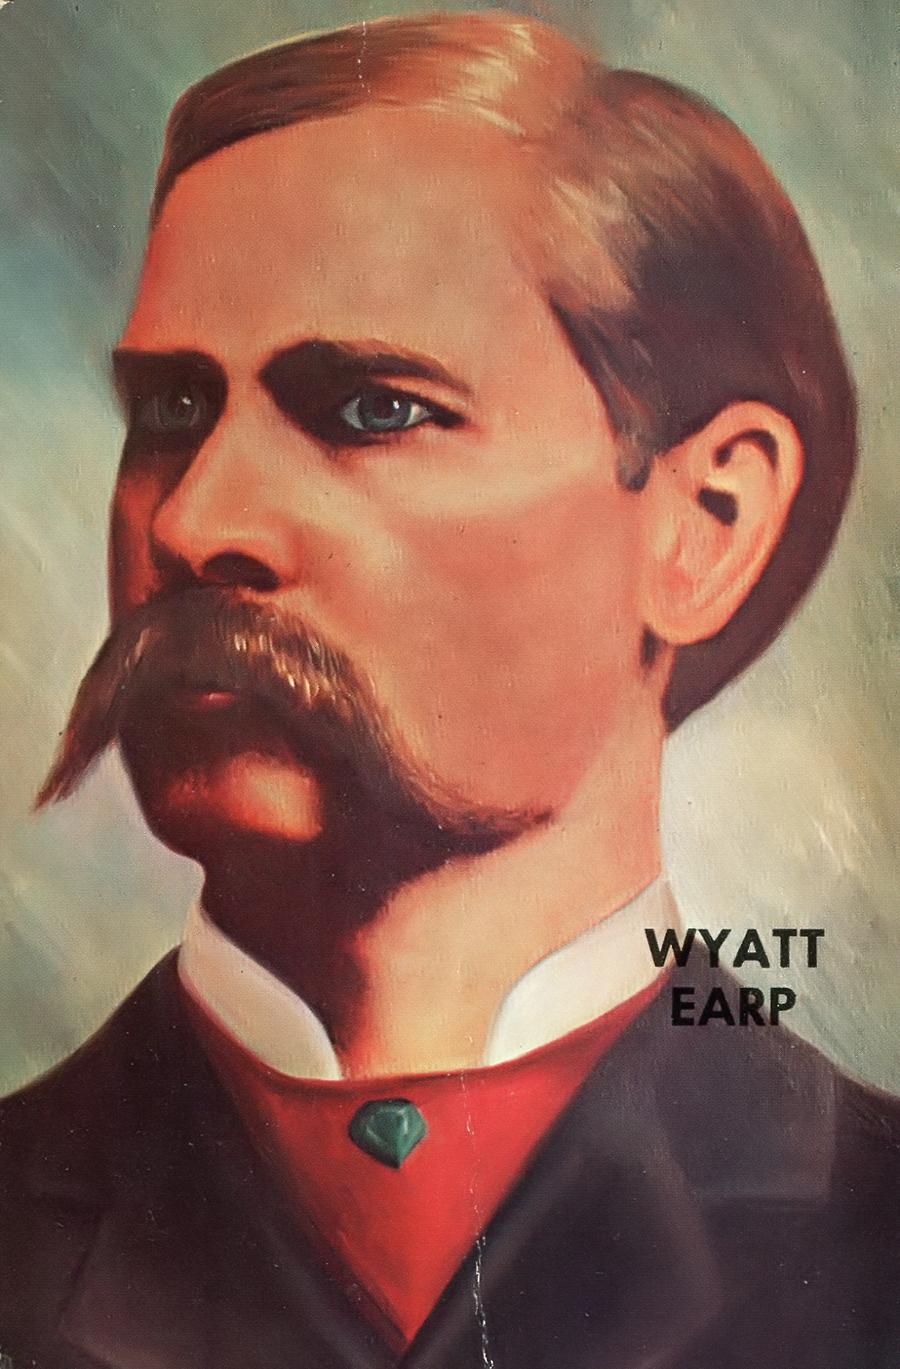 Wyatt Earp Photo